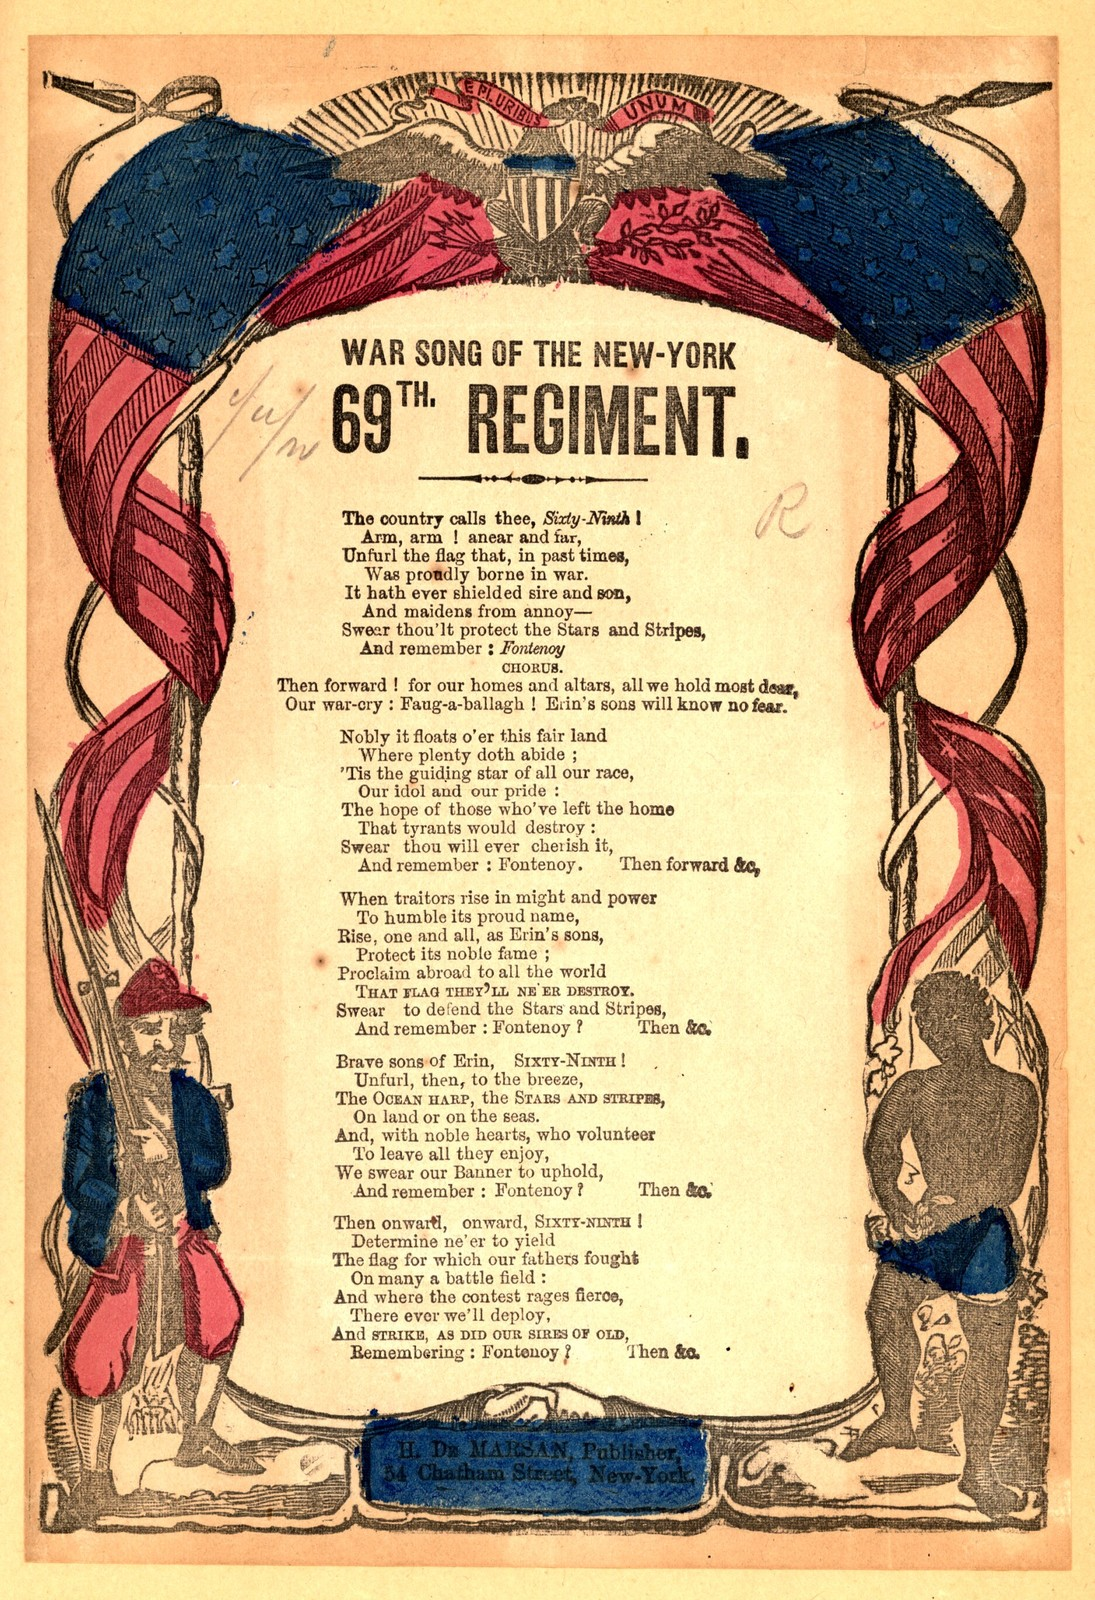 War song of the New-York 69th regiment. H. De Marsan, 54 Chatham Street, New York